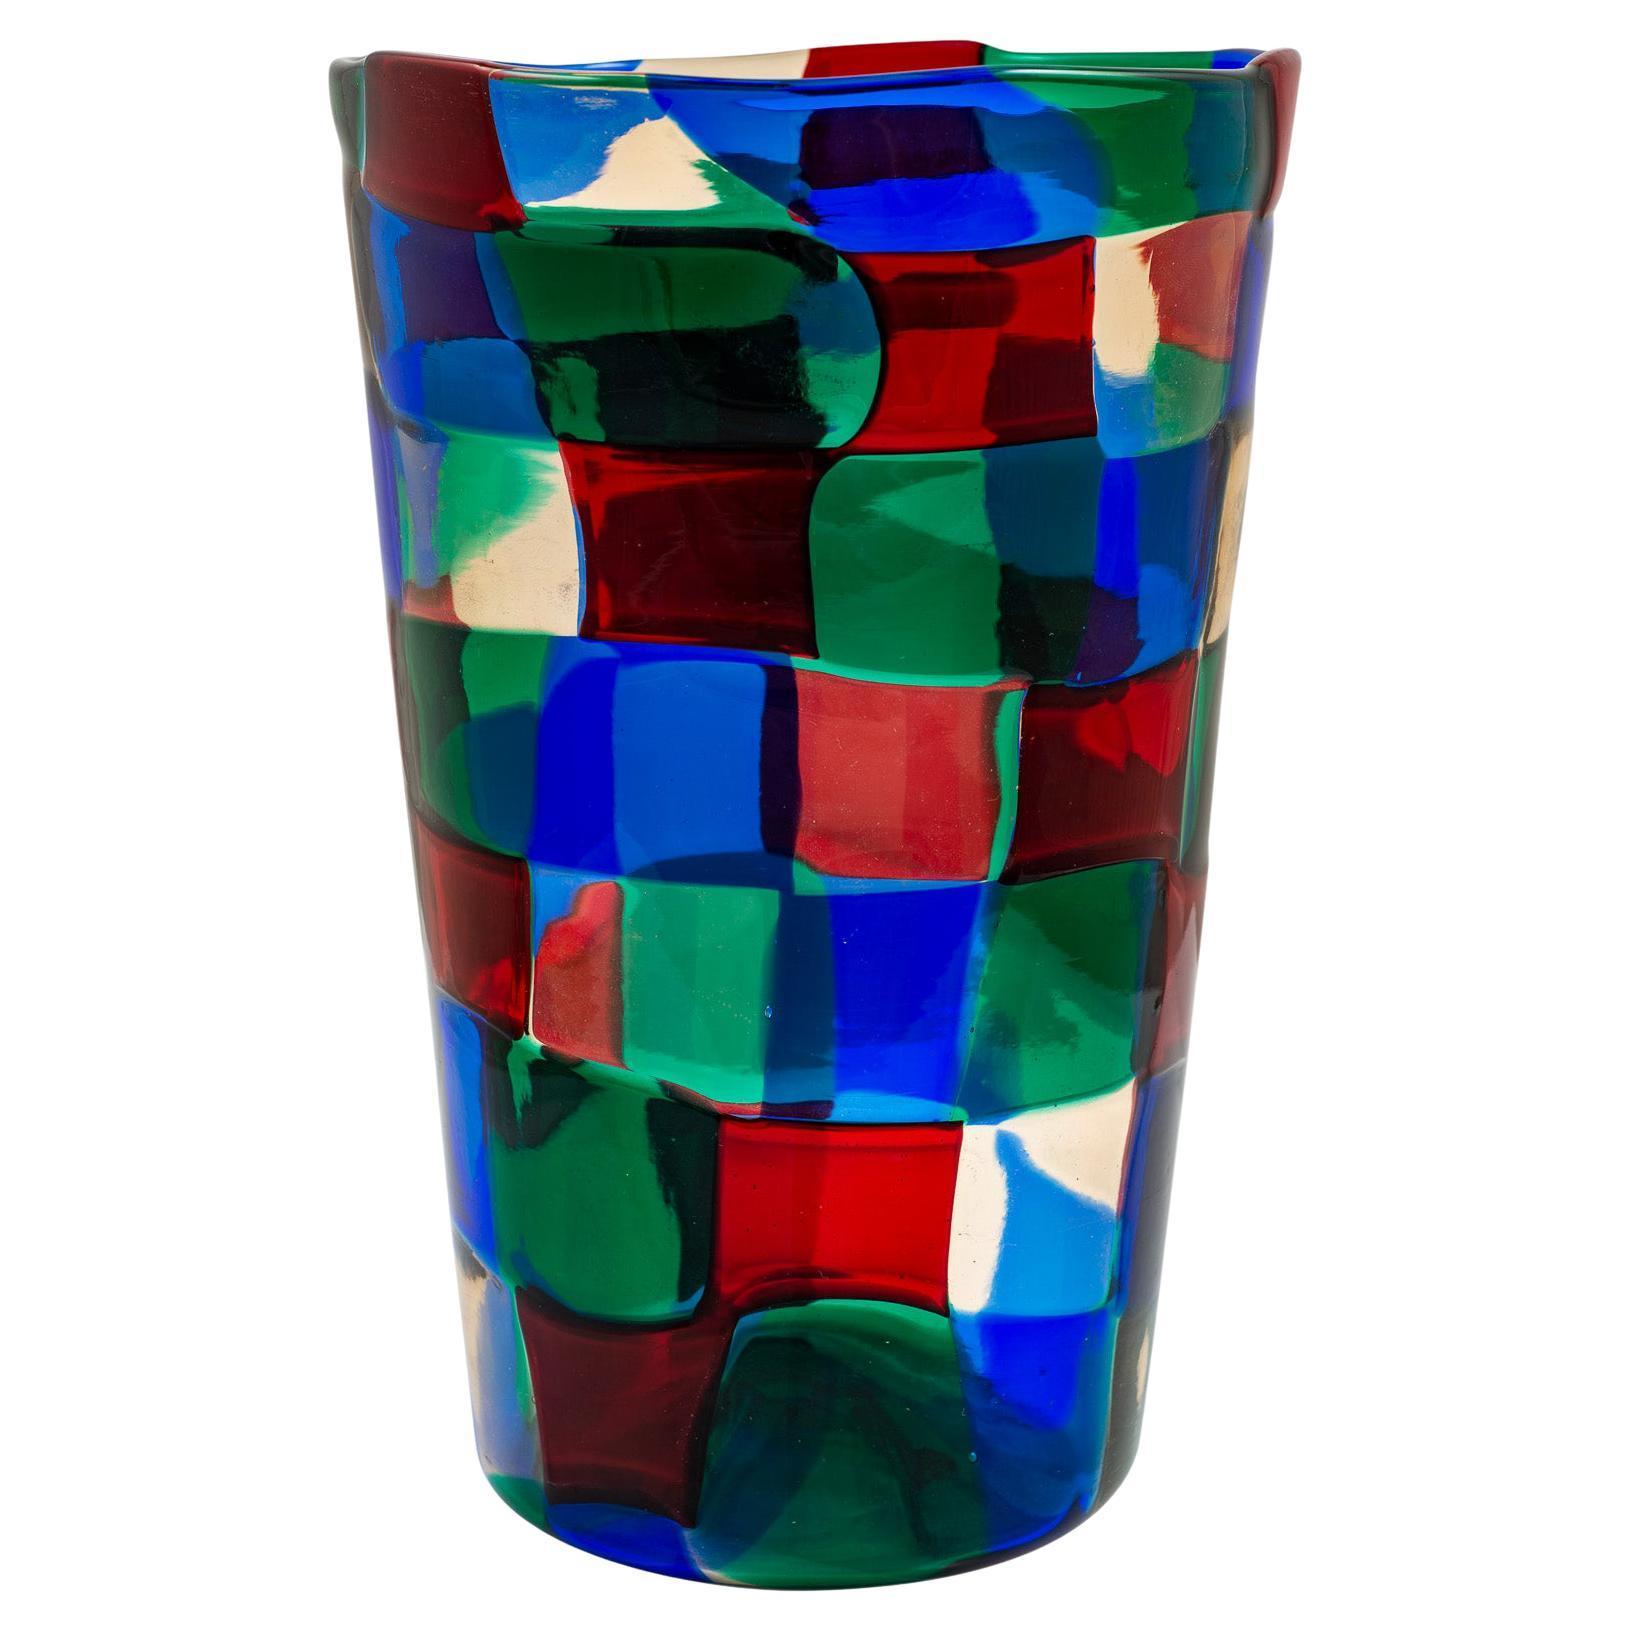 Fulvio Bianconi Vases and Vessels